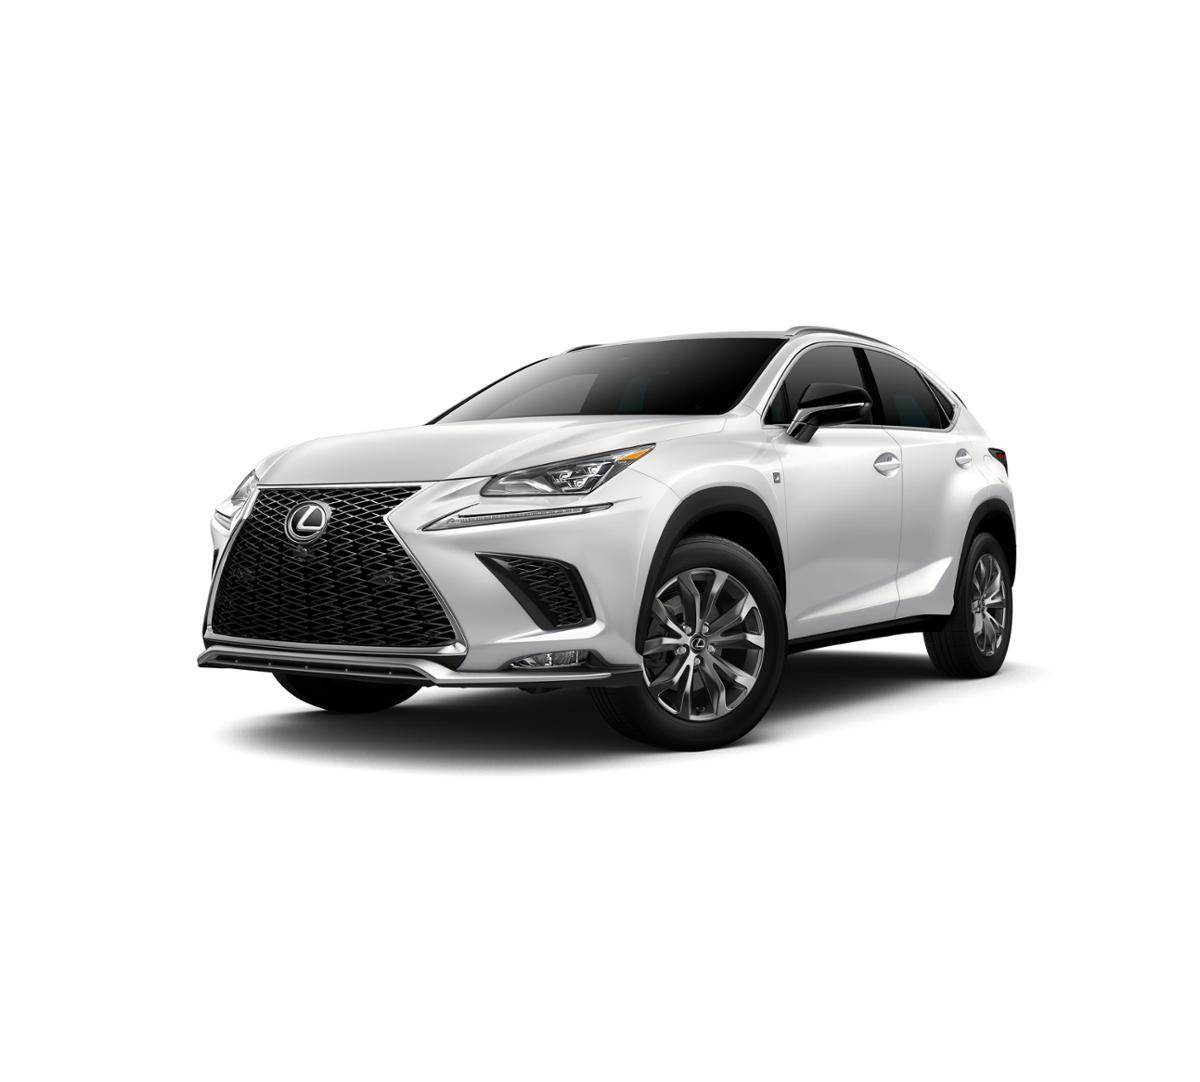 hight resolution of 2019 lexus nx 300 vehicle photo in peoria az 85382